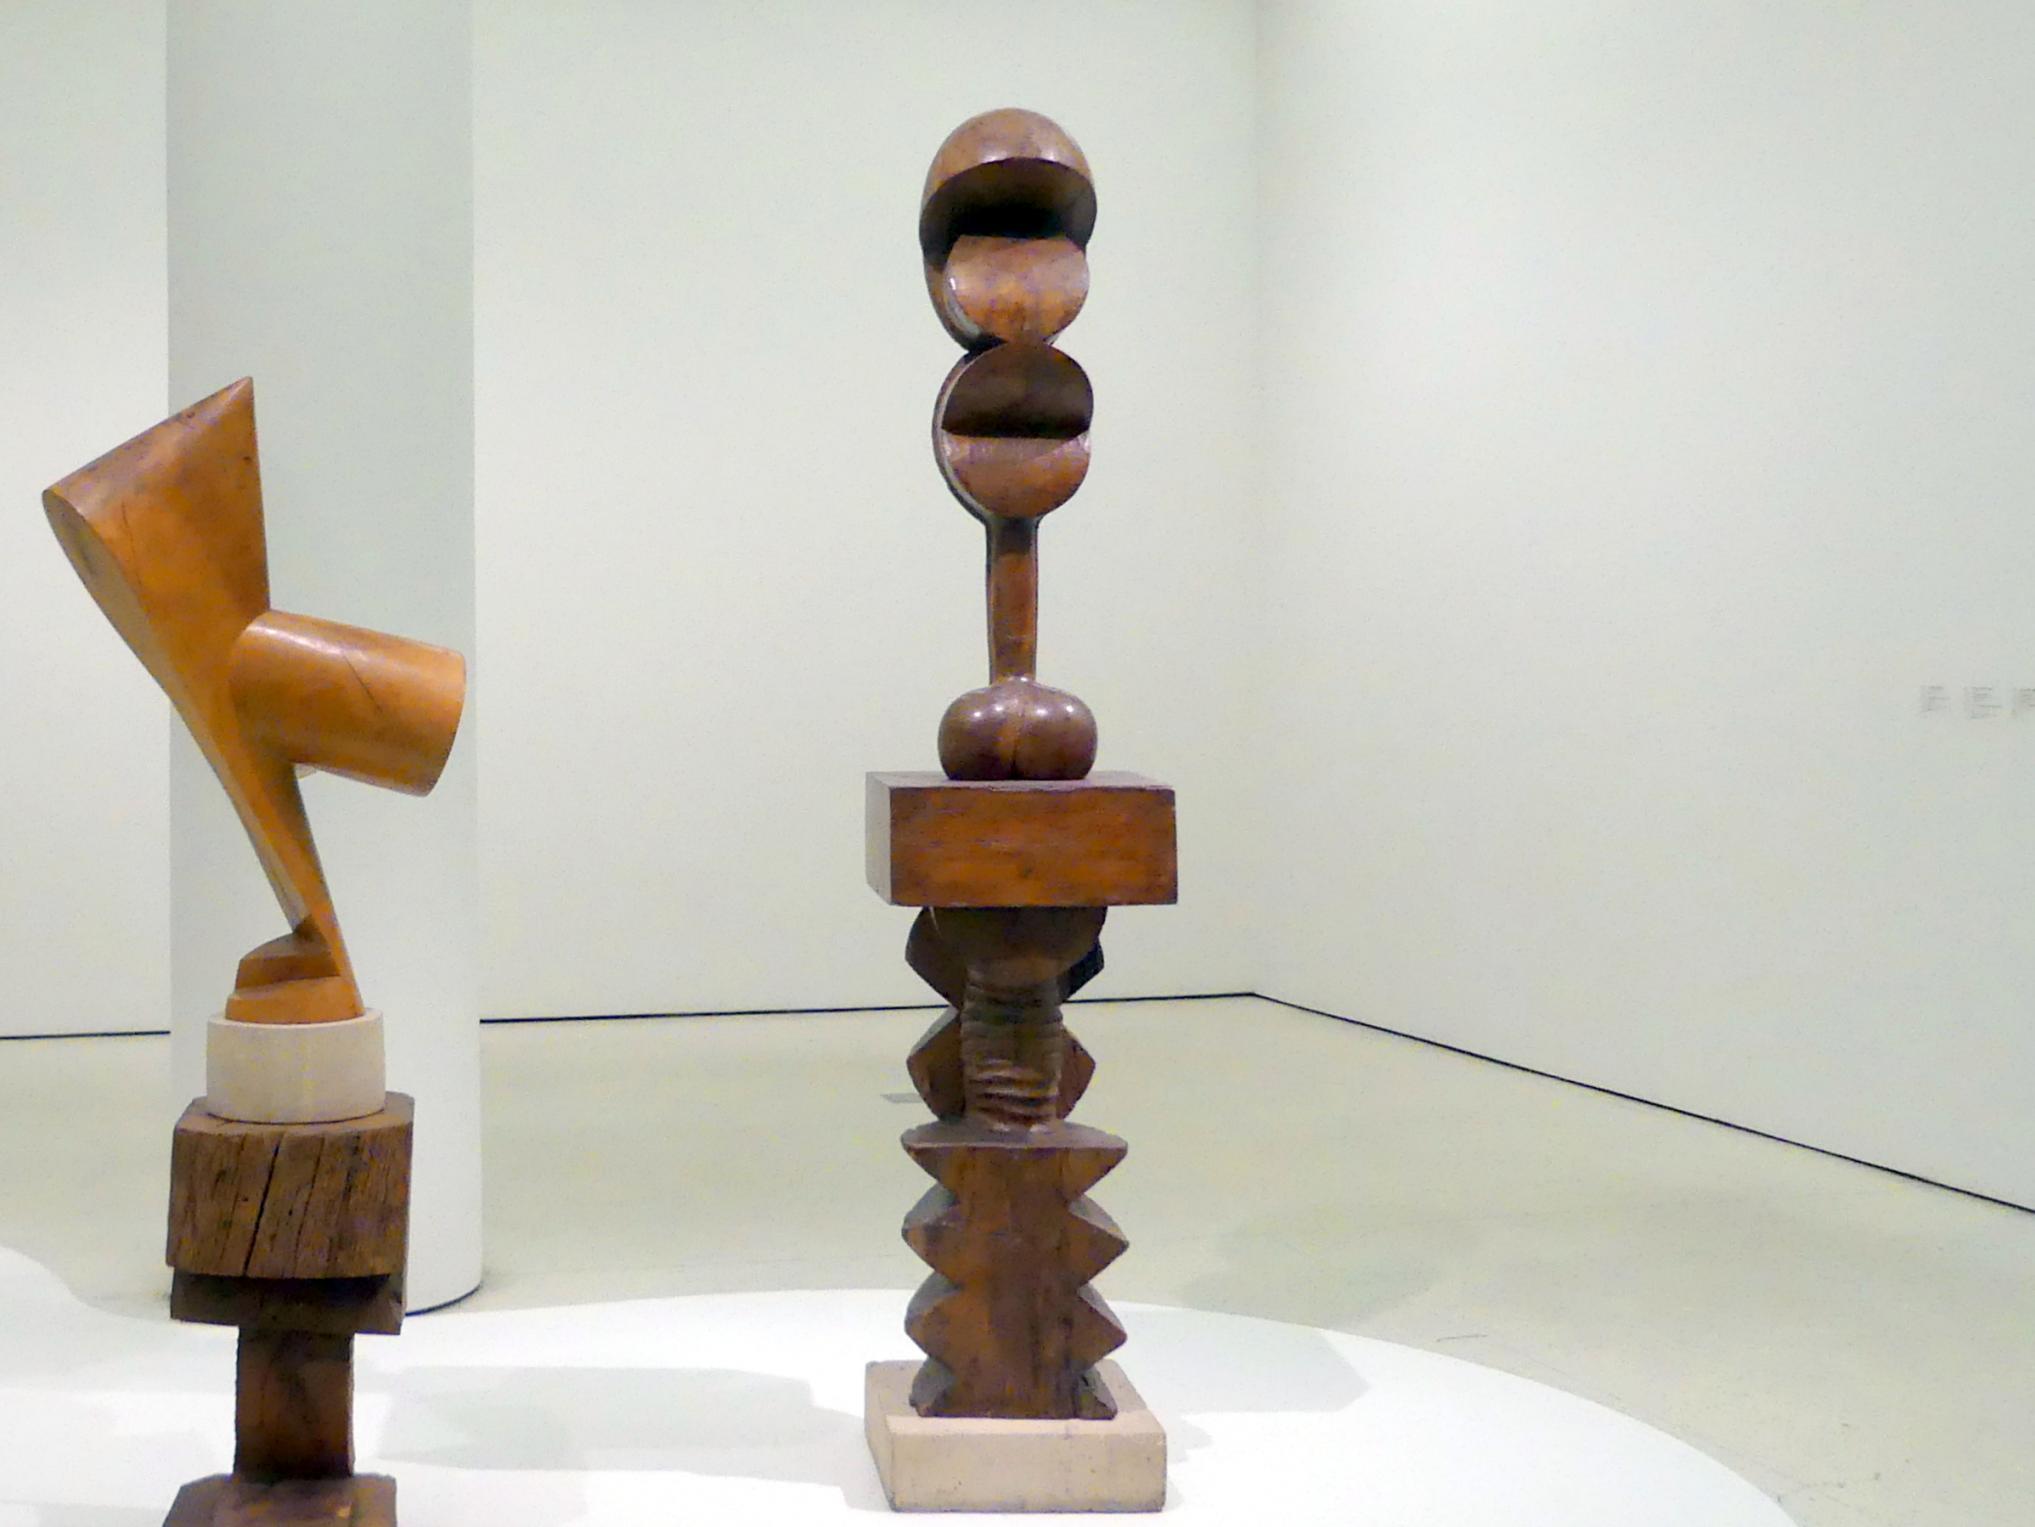 Constantin Brâncuși: Adam und Eva (Adam et Eve), 1921